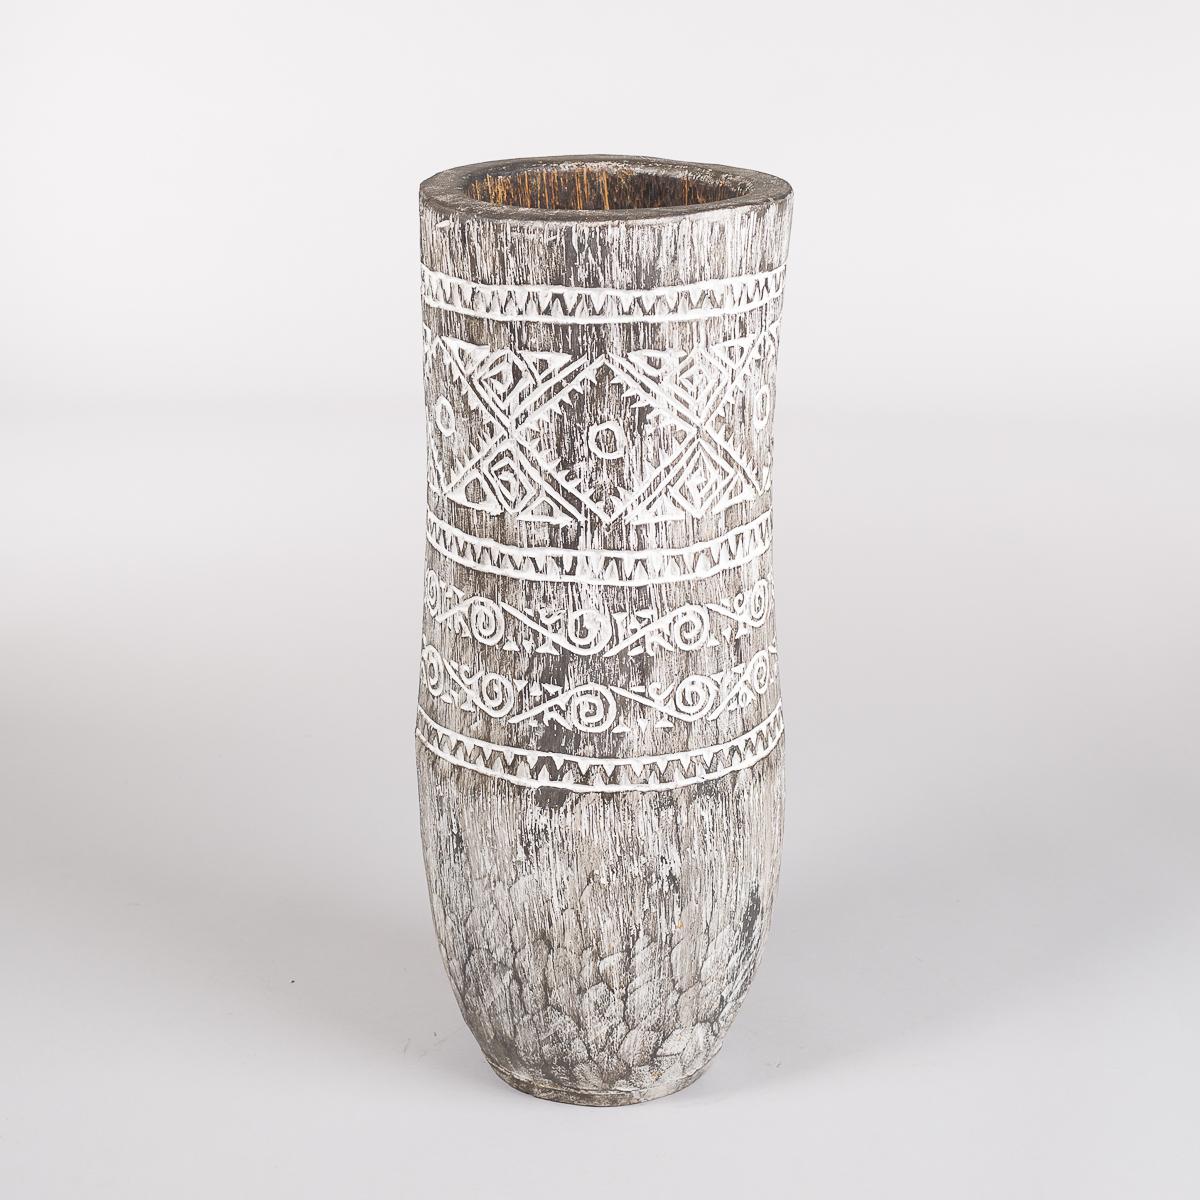 Palme potte høyde 60 cm-0